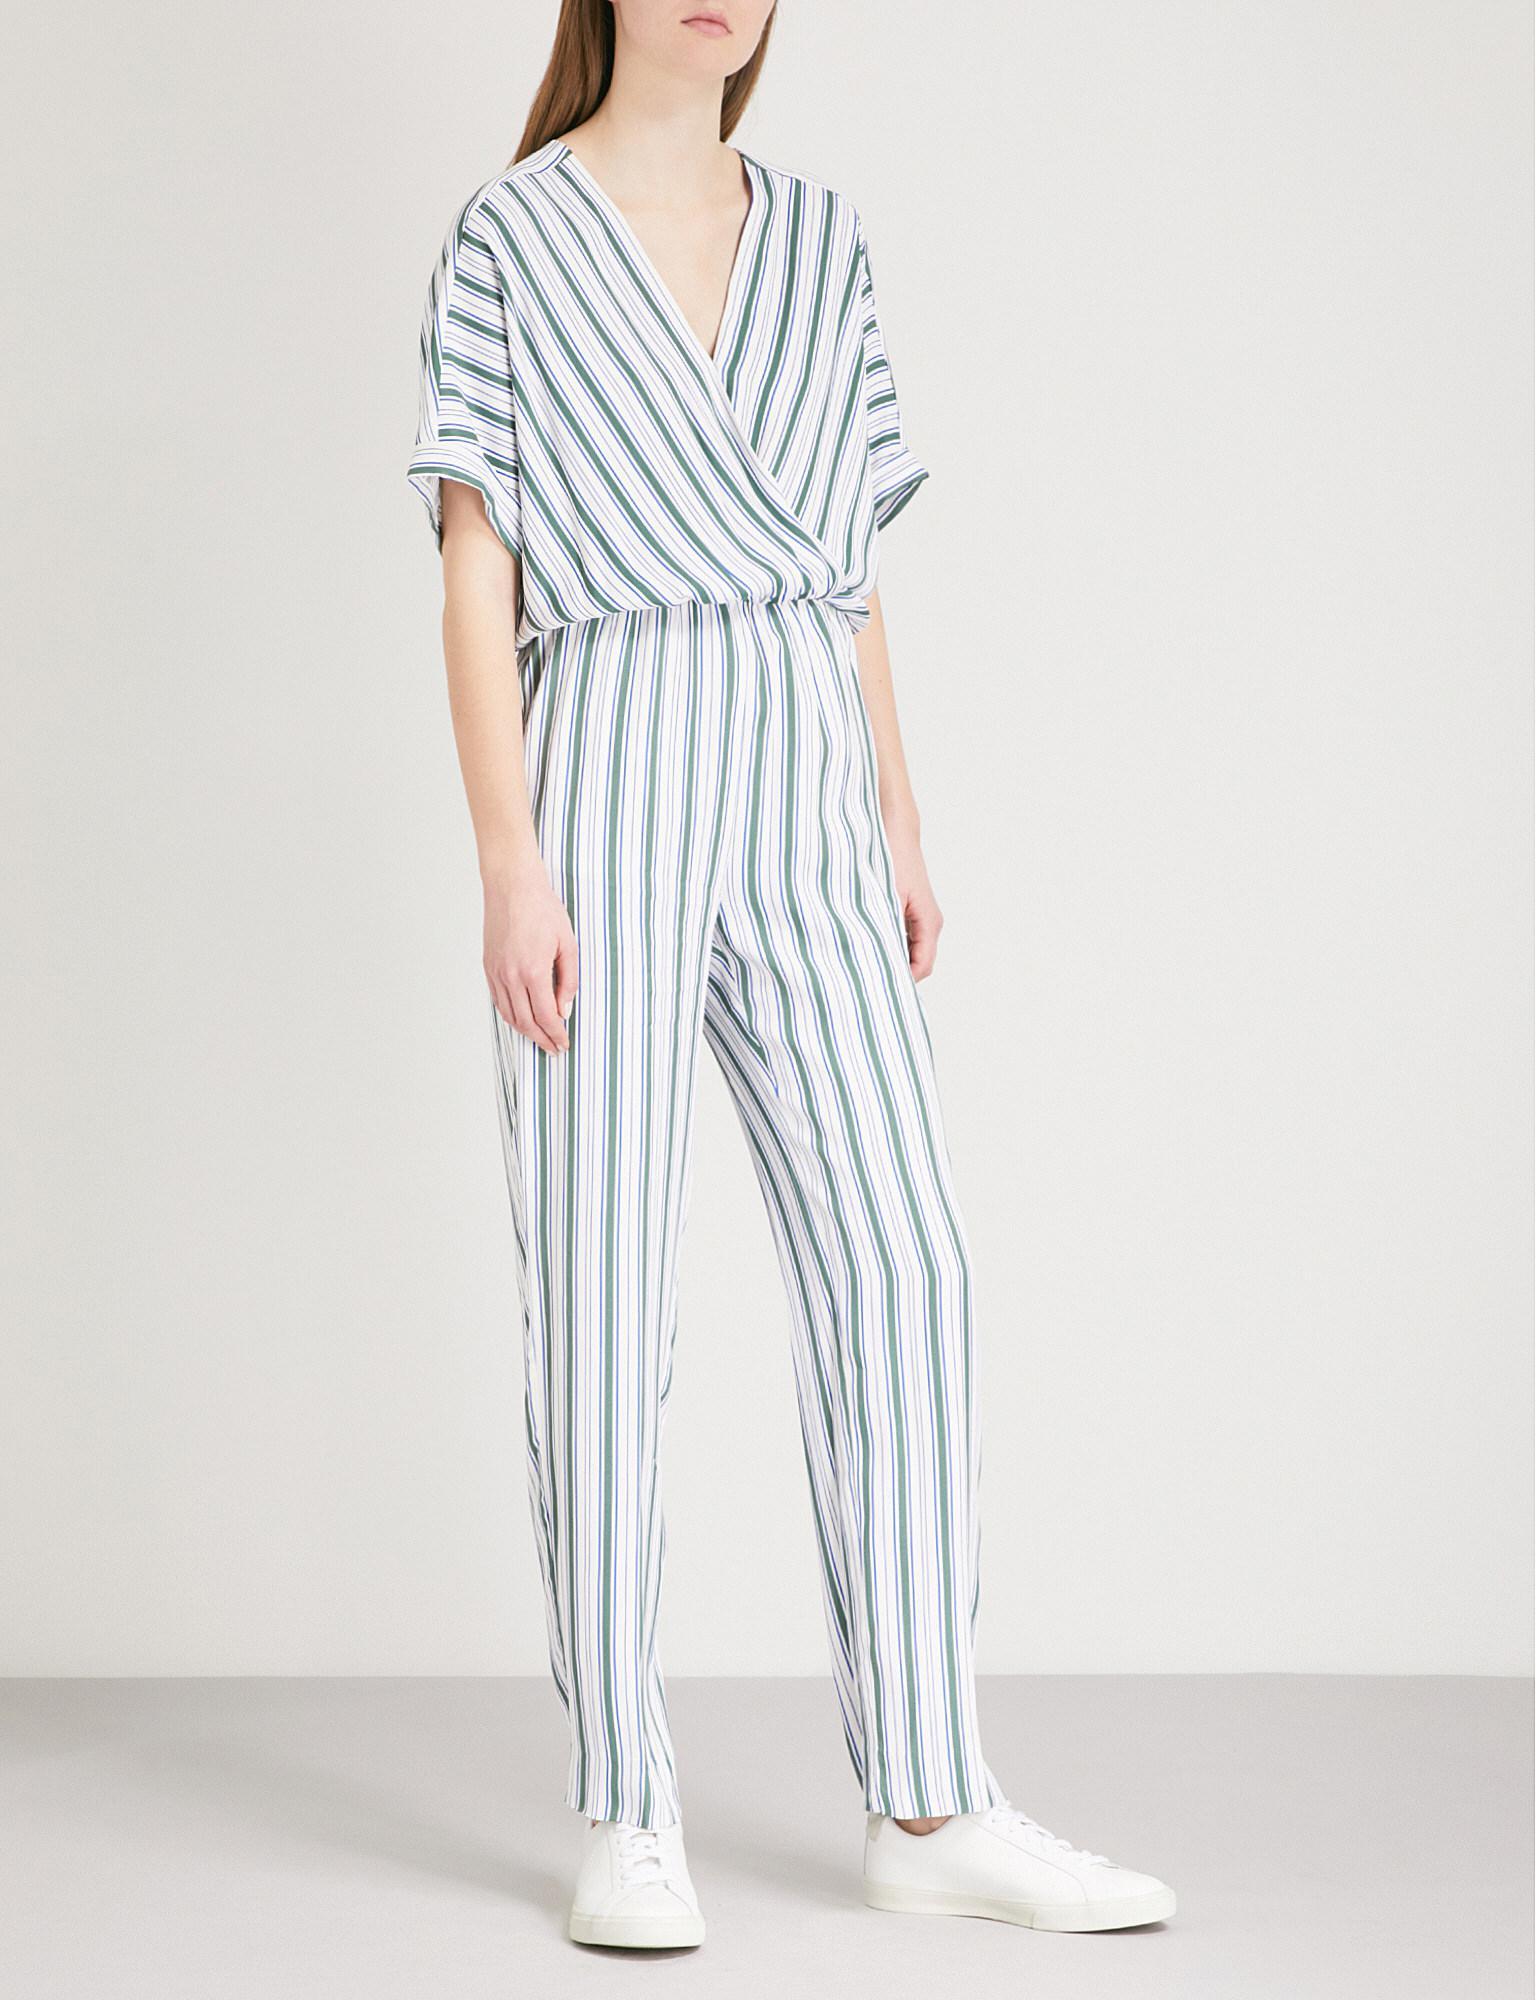 aefdb484bd0 Maje Pandro Striped Twill Jumpsuit in Blue - Lyst